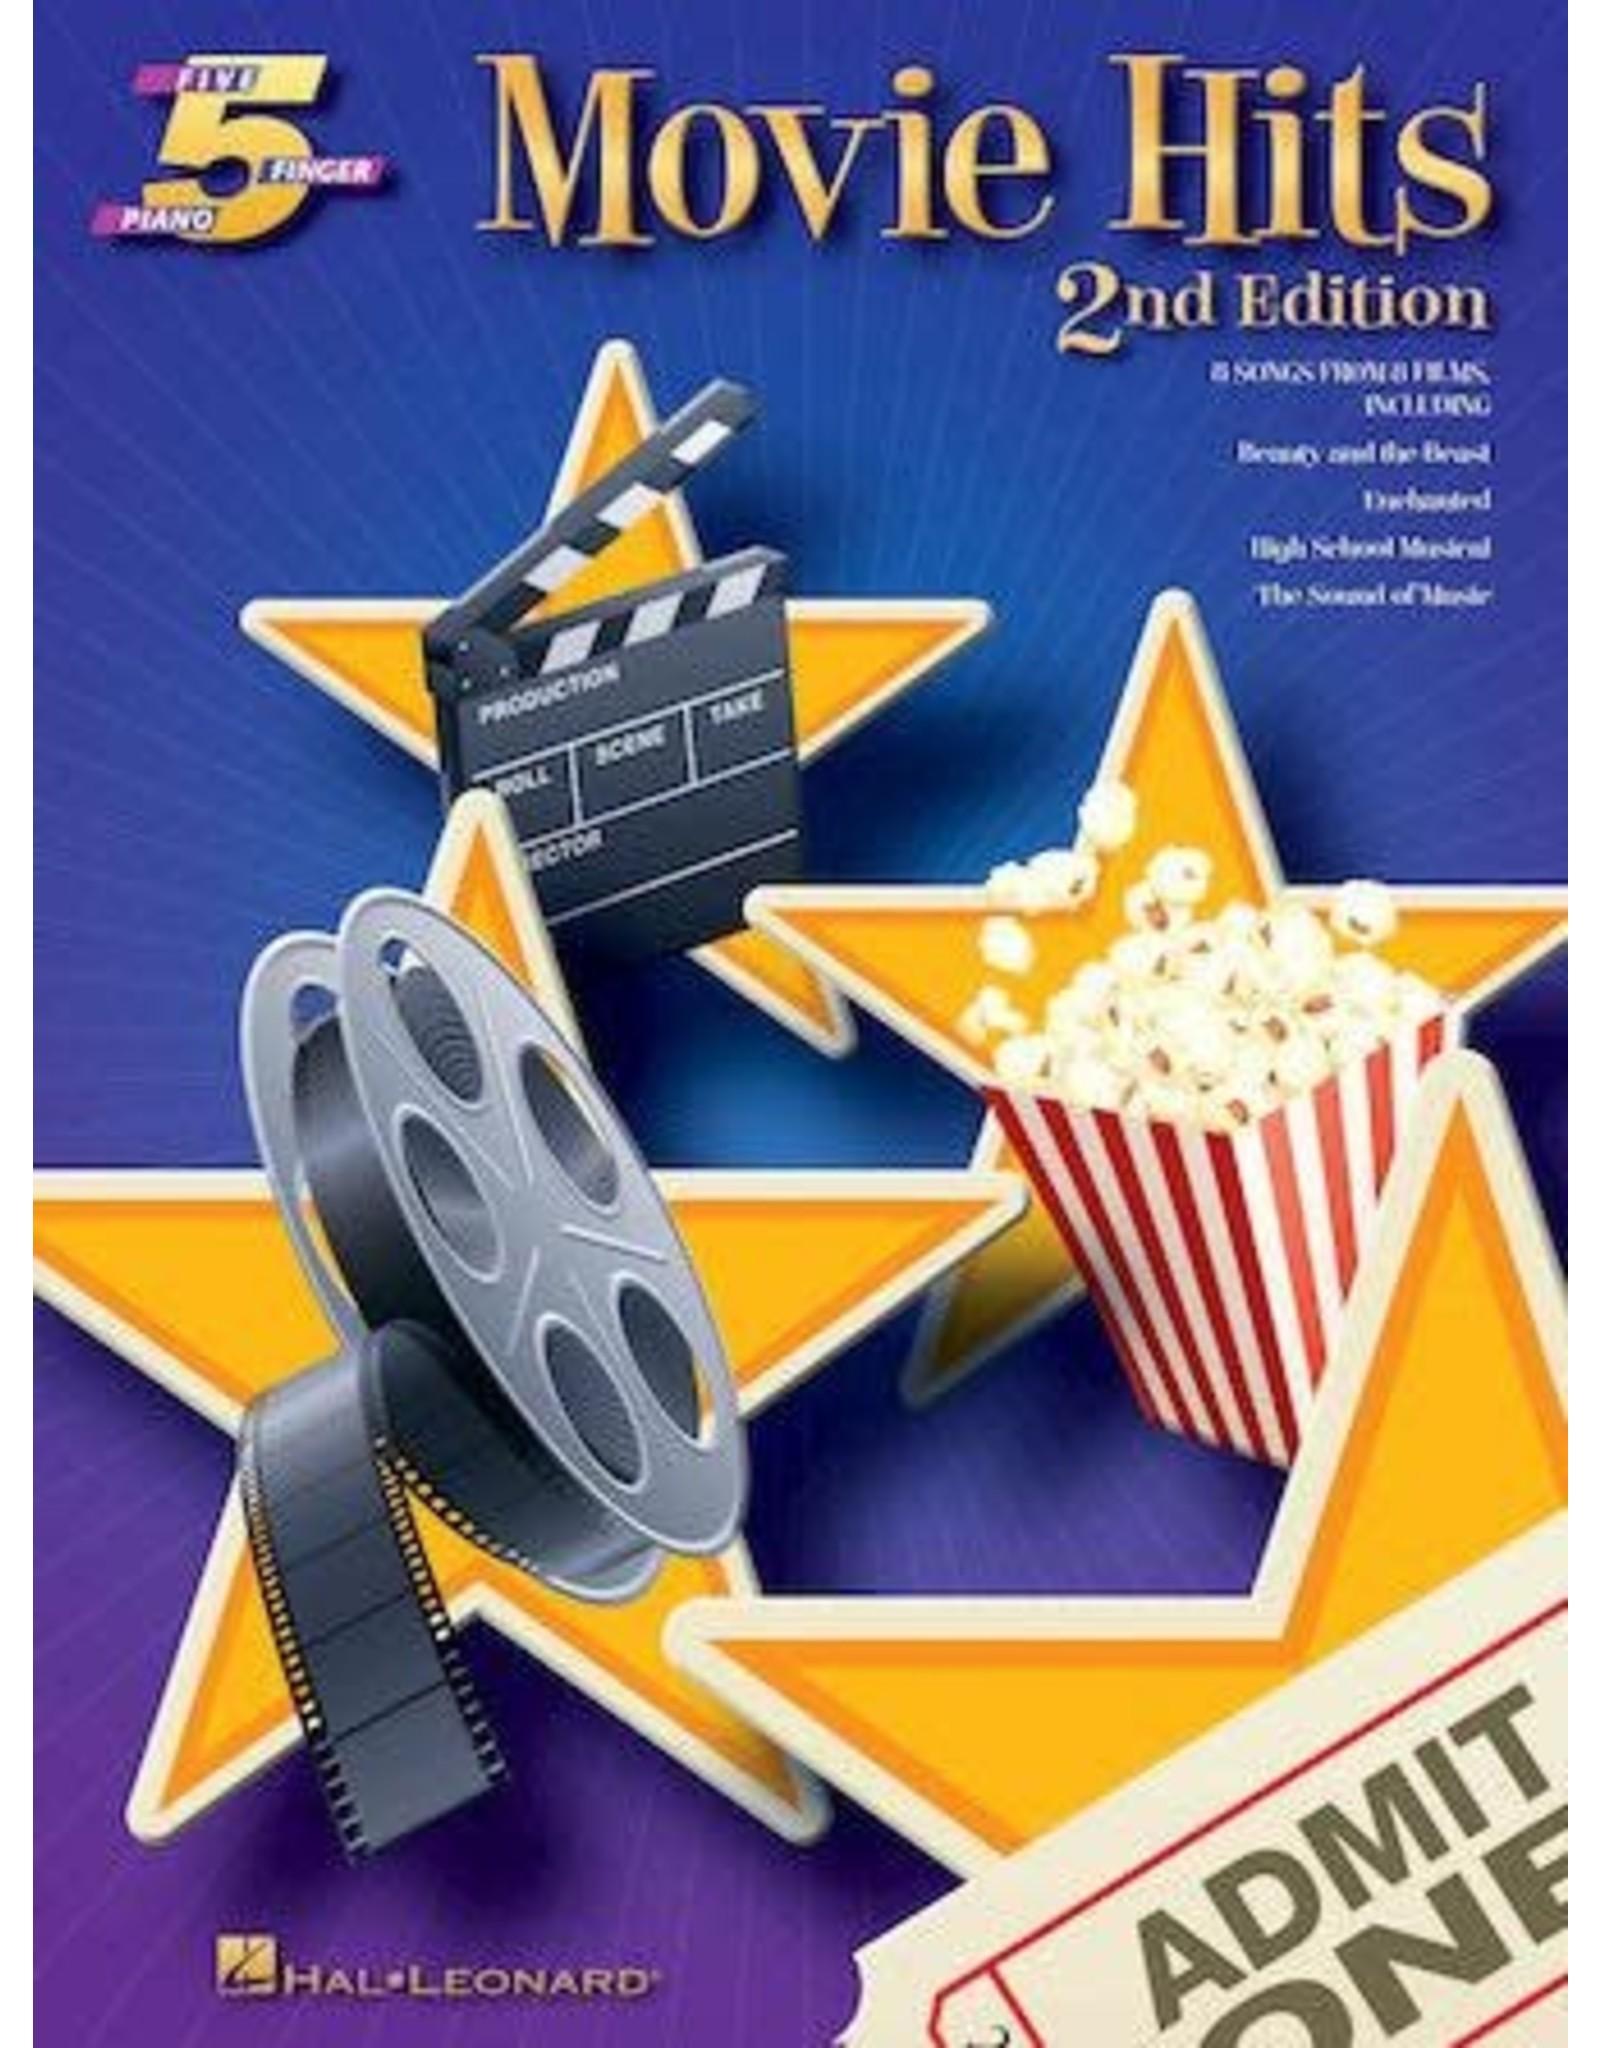 Hal Leonard Movie Hits 5 Finger - 2nd Edition